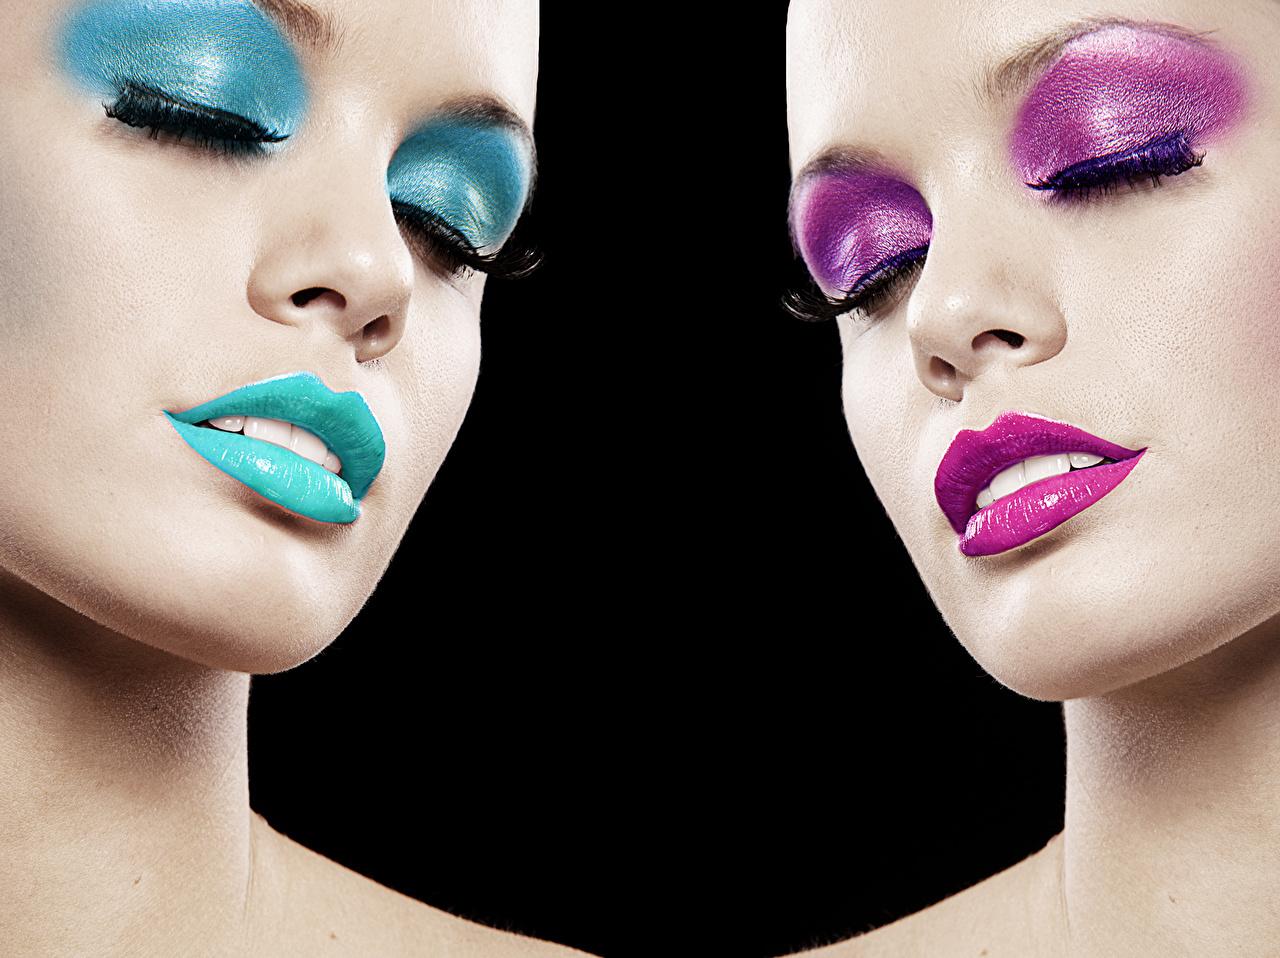 Картинки Макияж Нос Лицо Девушки Губы мейкап